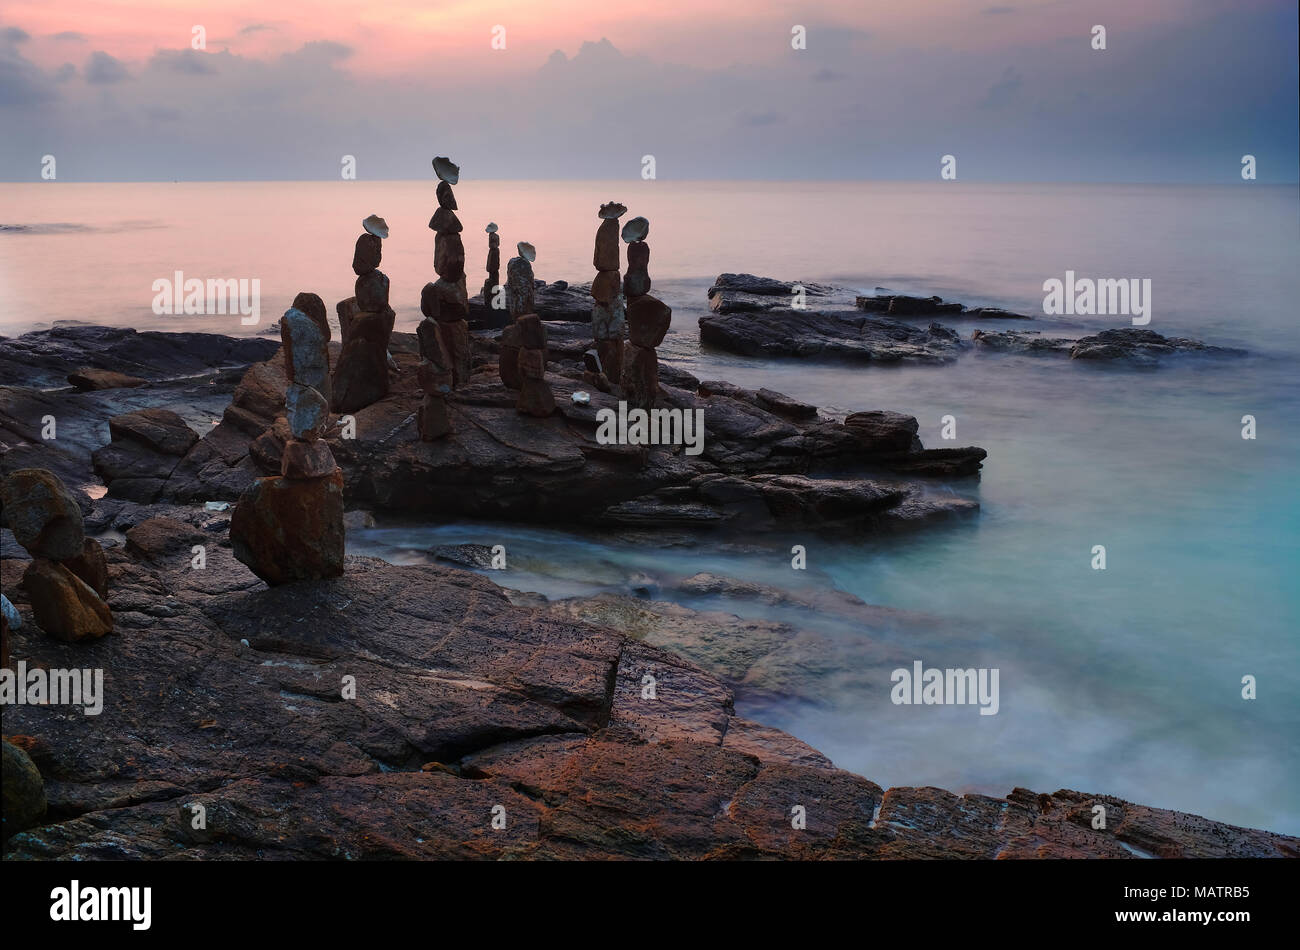 Balanced stones on foreshore, Ko Samed - Stock Image